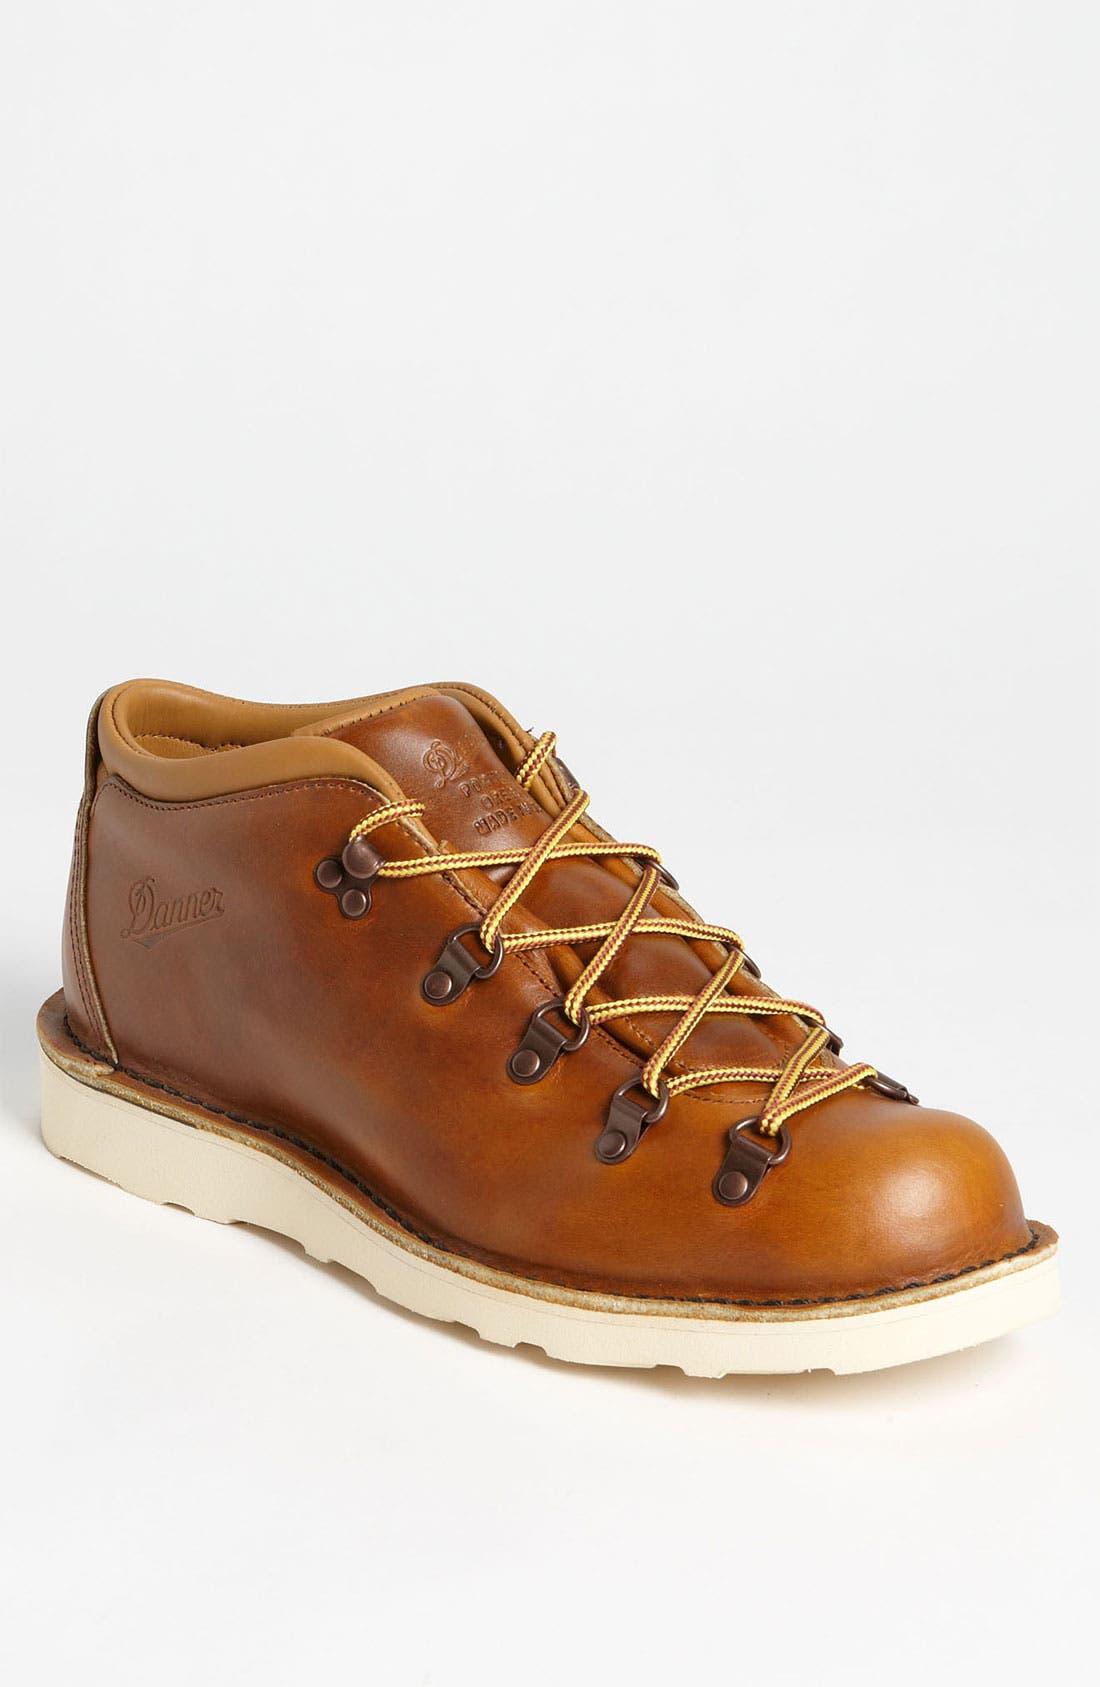 Alternate Image 1 Selected - Danner 'Tramline' Round Toe Boot (Online Only)